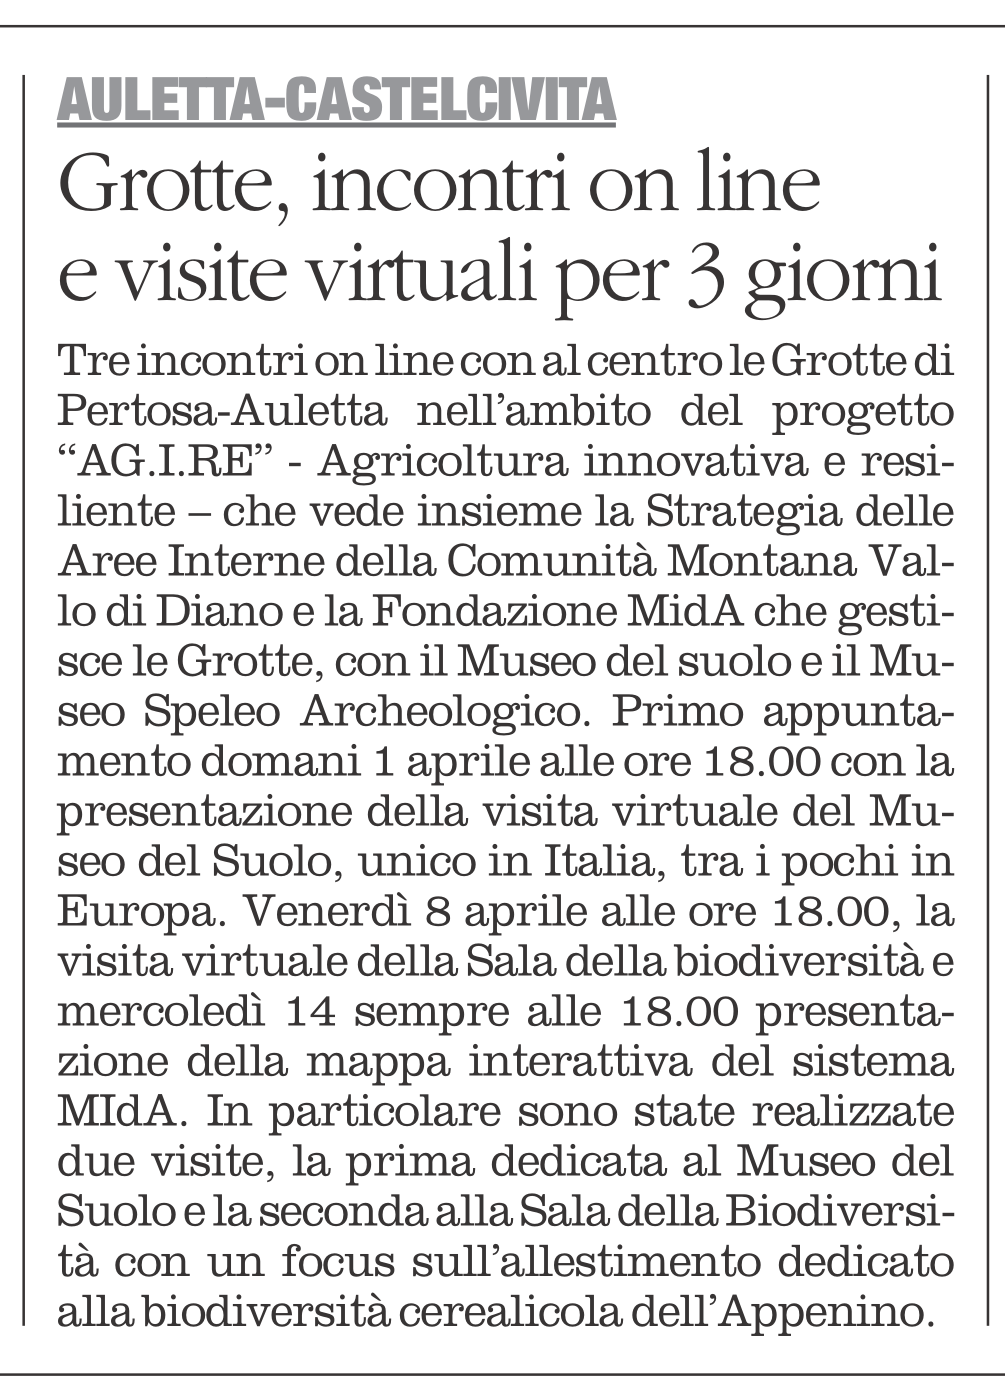 Grotte Castelcivita, visite virtuali